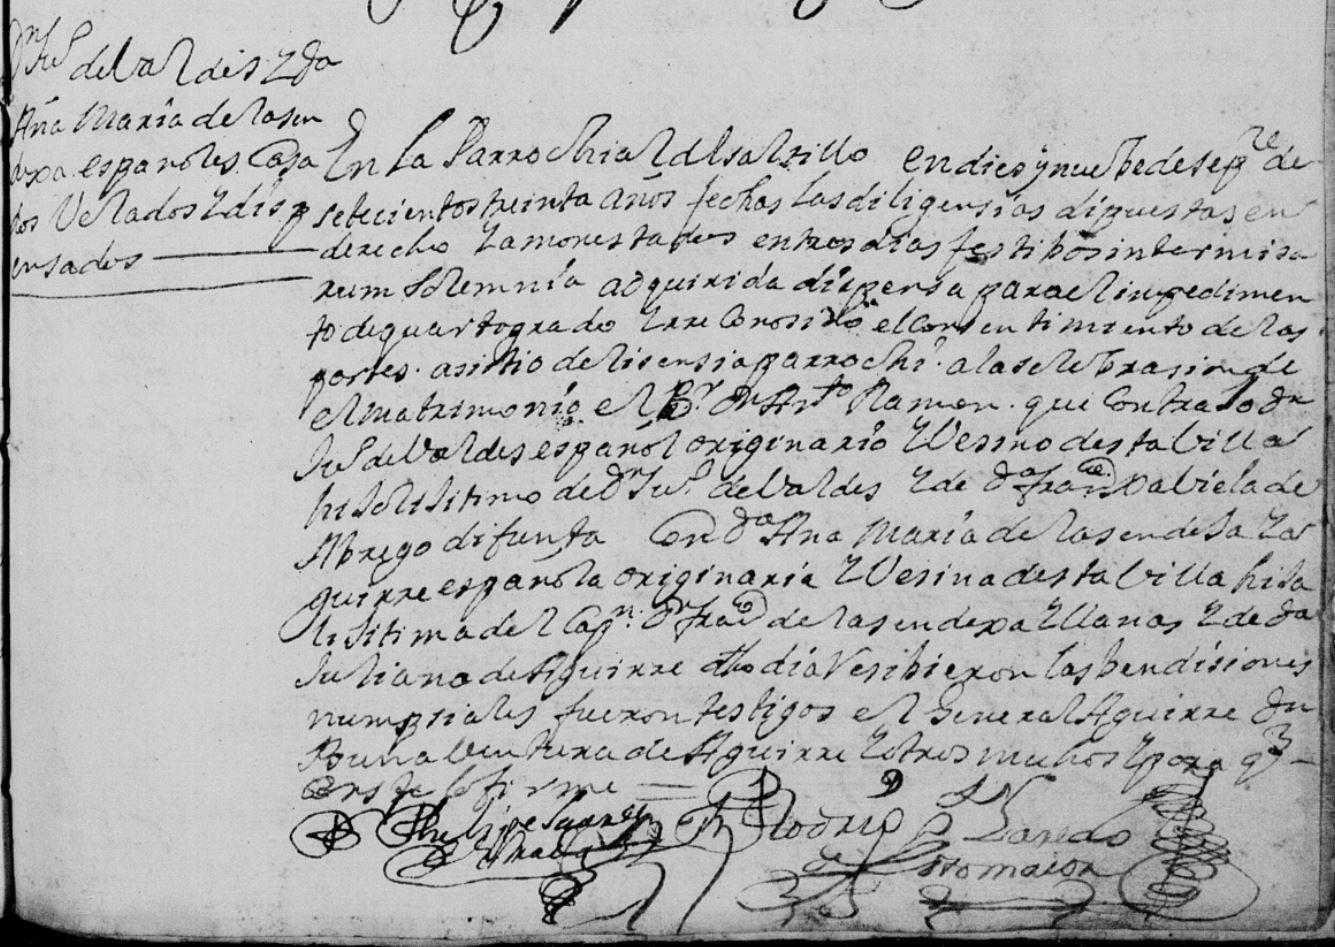 Juan Valdez Abrego and Ana Maria Sendeja Llanas FamilySearch, Saltillo, Coahuila, Mexico 1730 Pg. 180